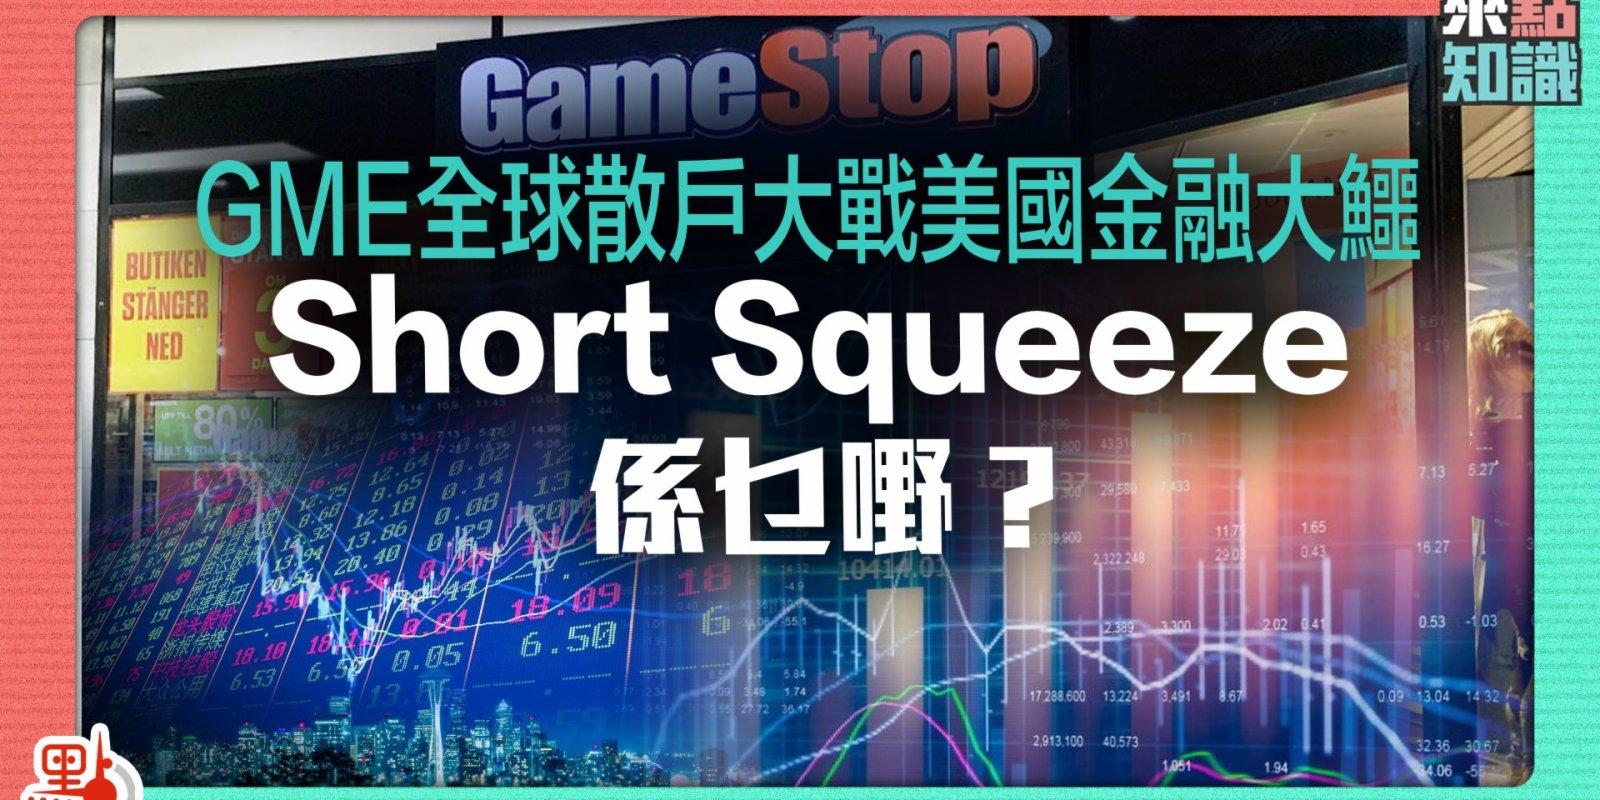 GME全球散戶大戰美國金融大鱷 Short Squeeze係乜嘢?【來點知識EP3】